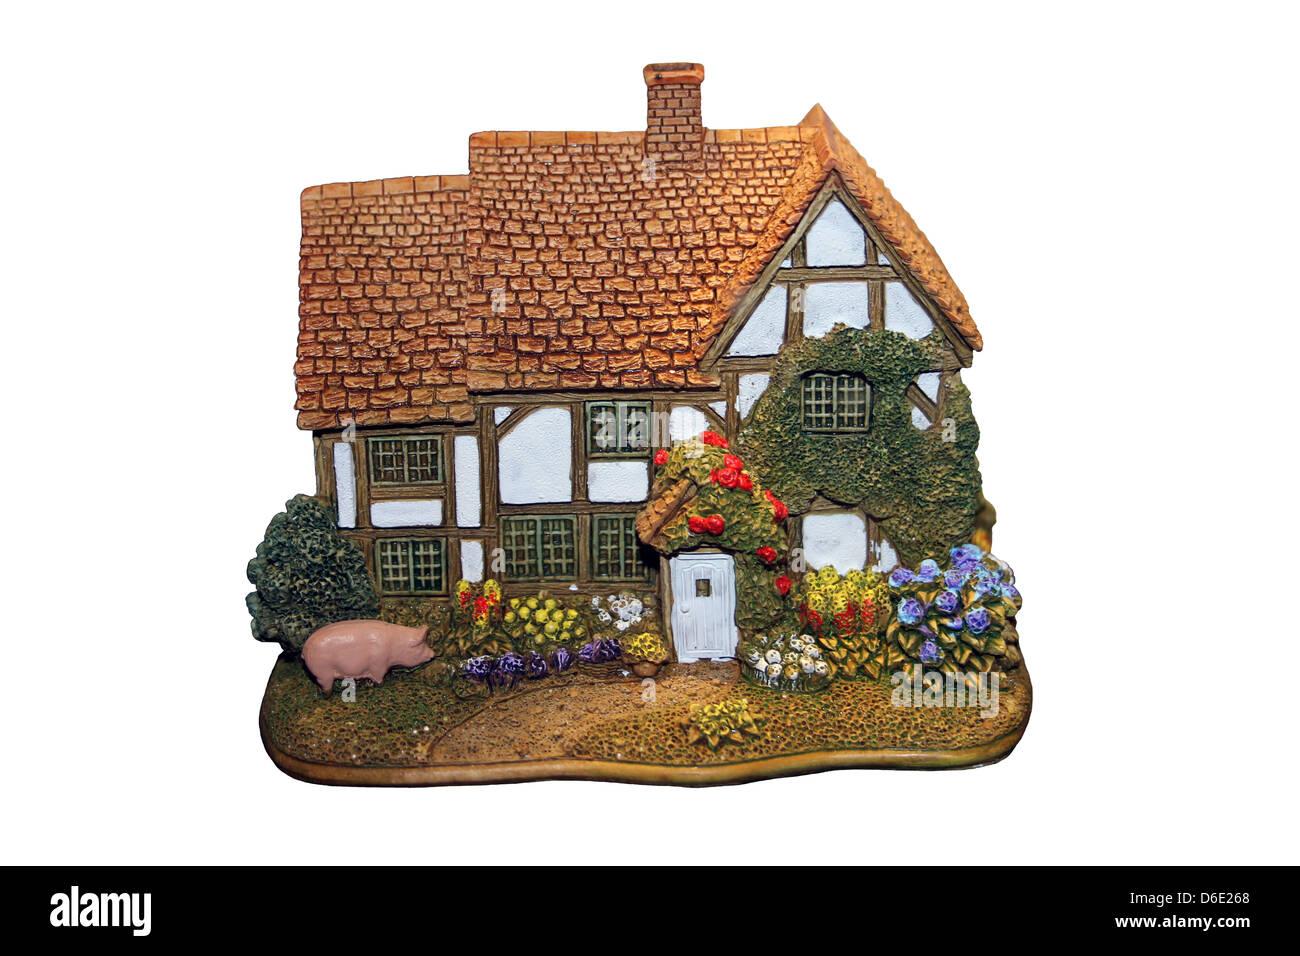 Lilliput Lane Sage Cottage - Stock Image